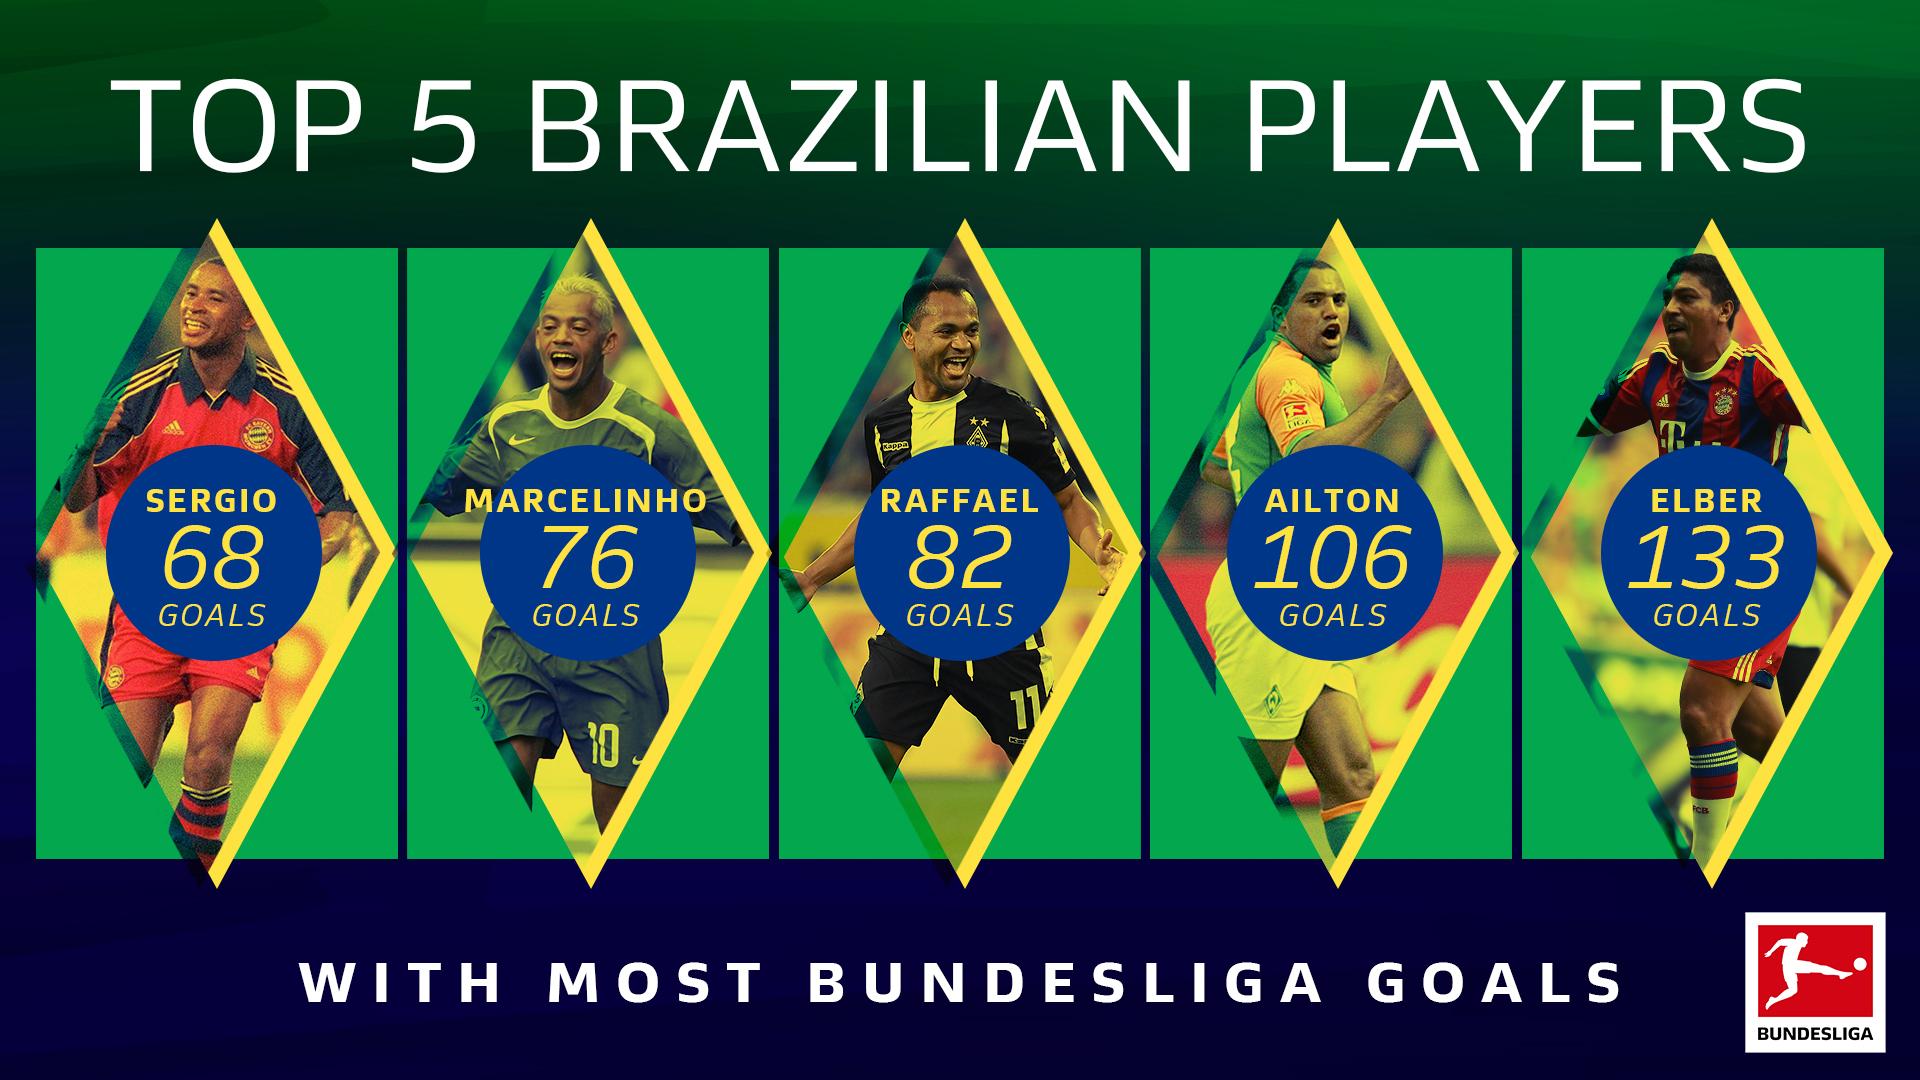 Top-5-Brazlian-Scorers.jpg